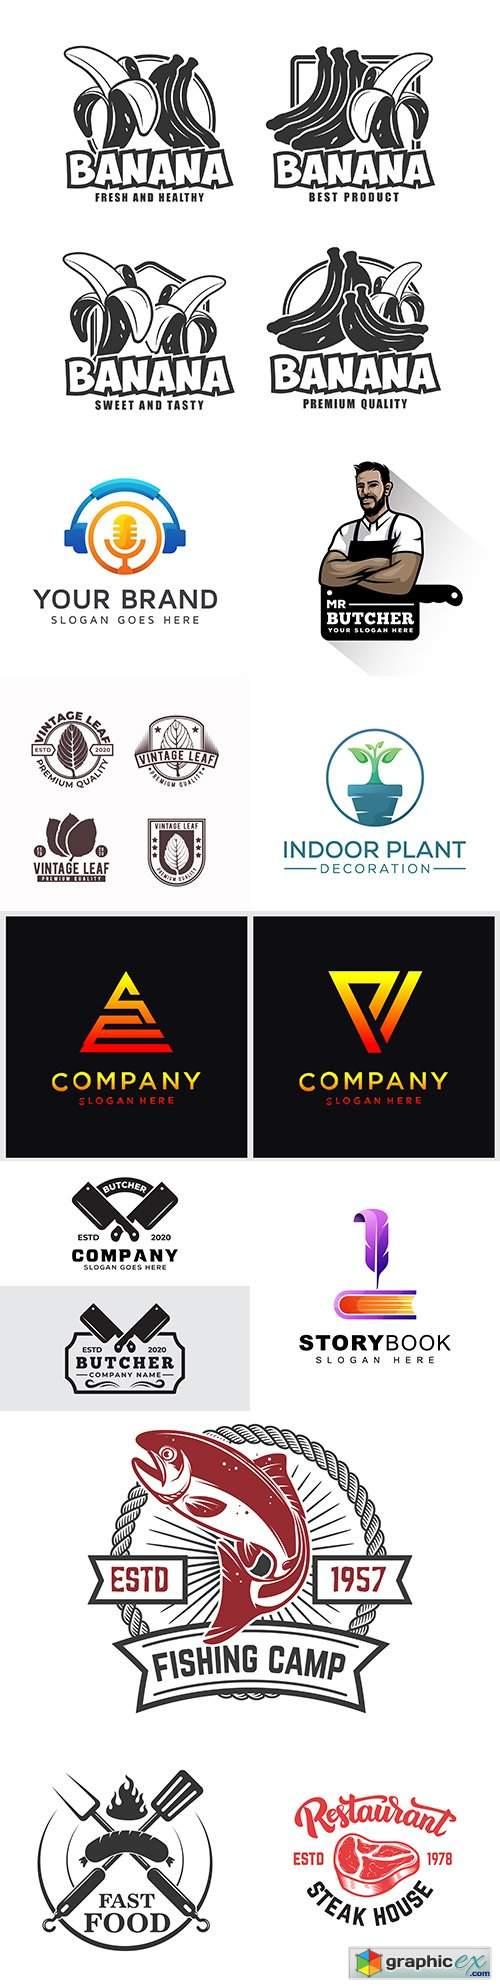 Brand name company logos business corporate design 42